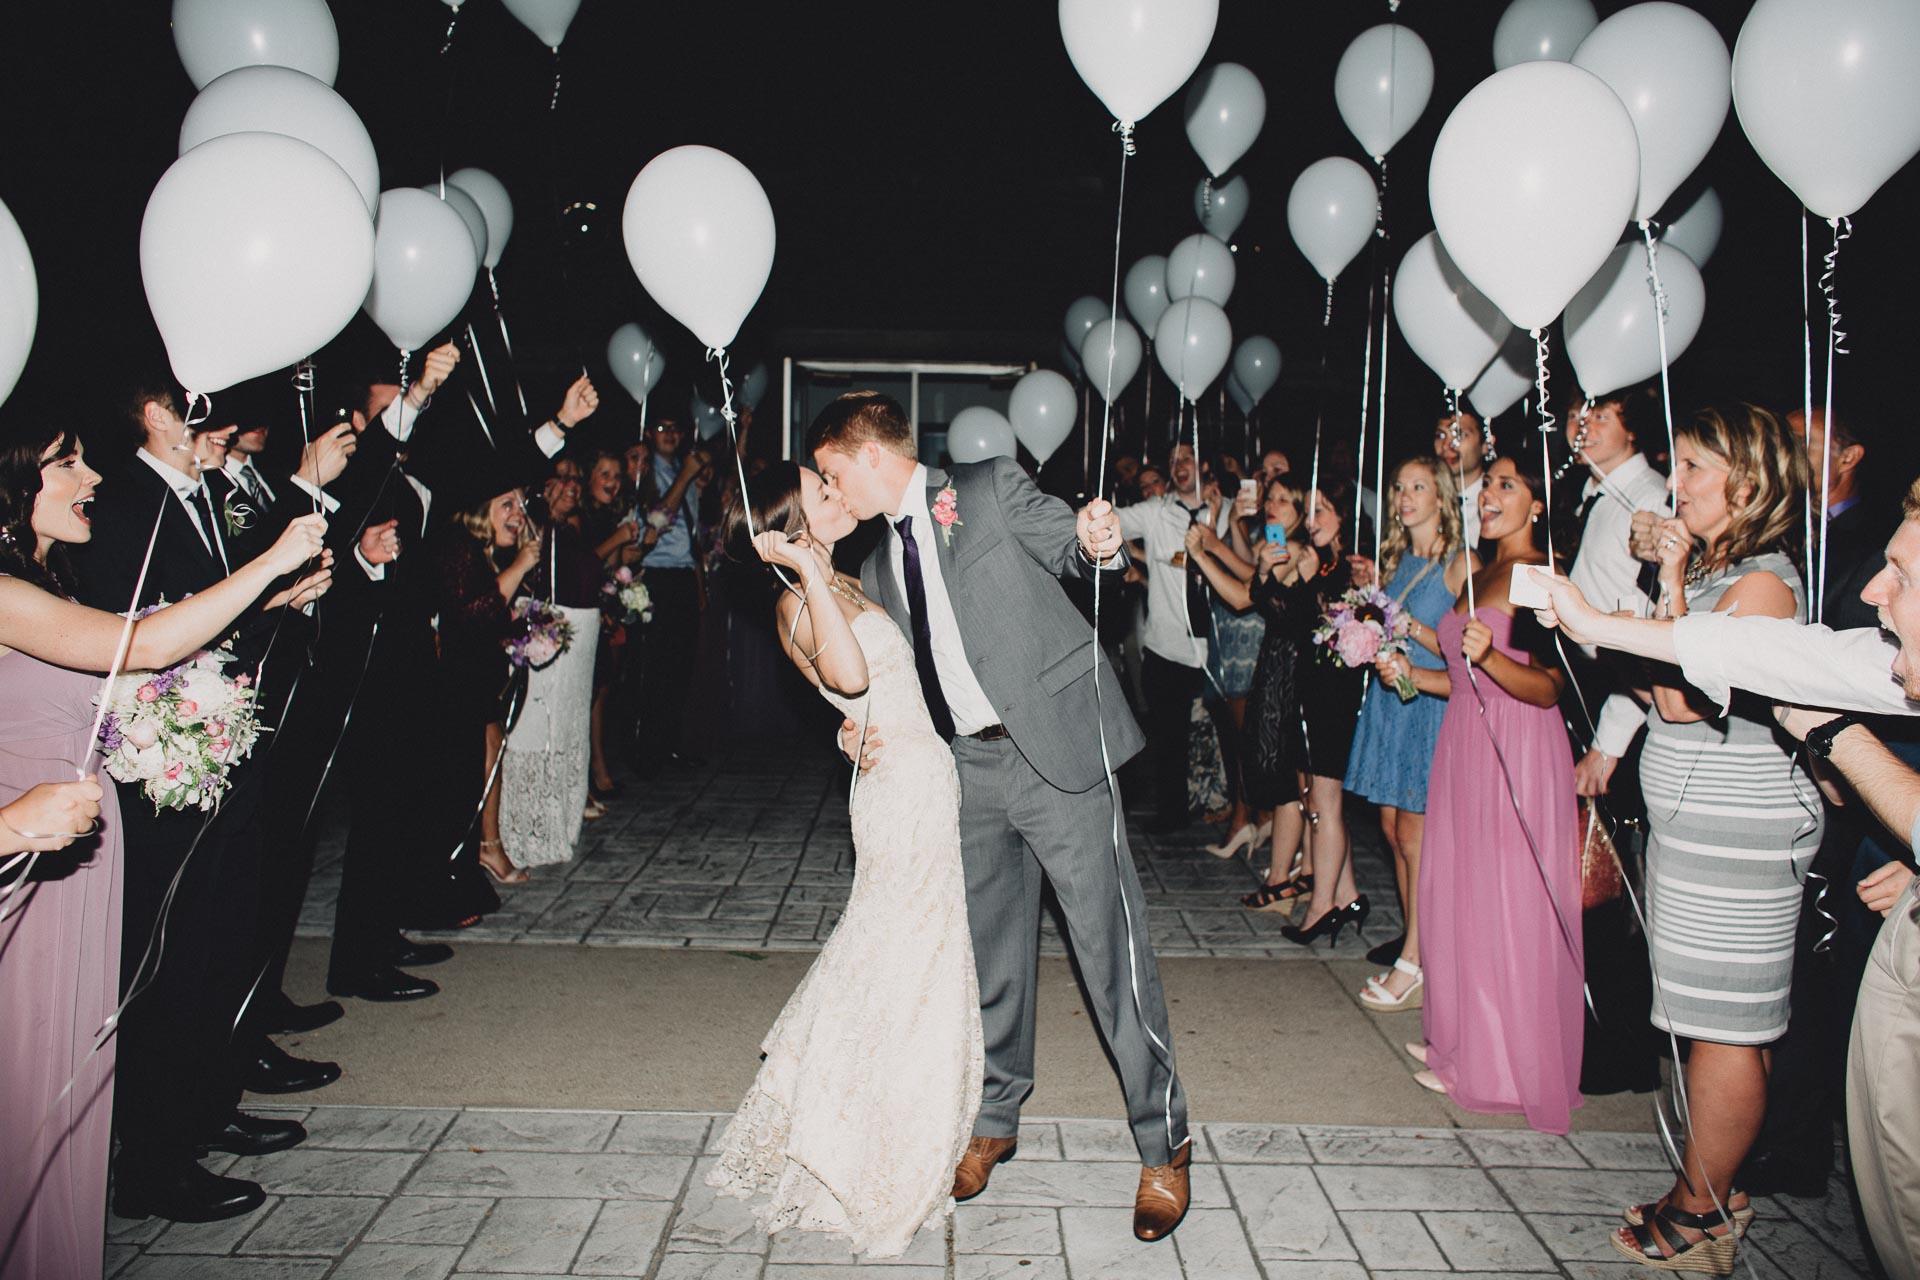 Julia-Michael-Cincinnati-Music-Hall-Wedding-145@2x.jpg